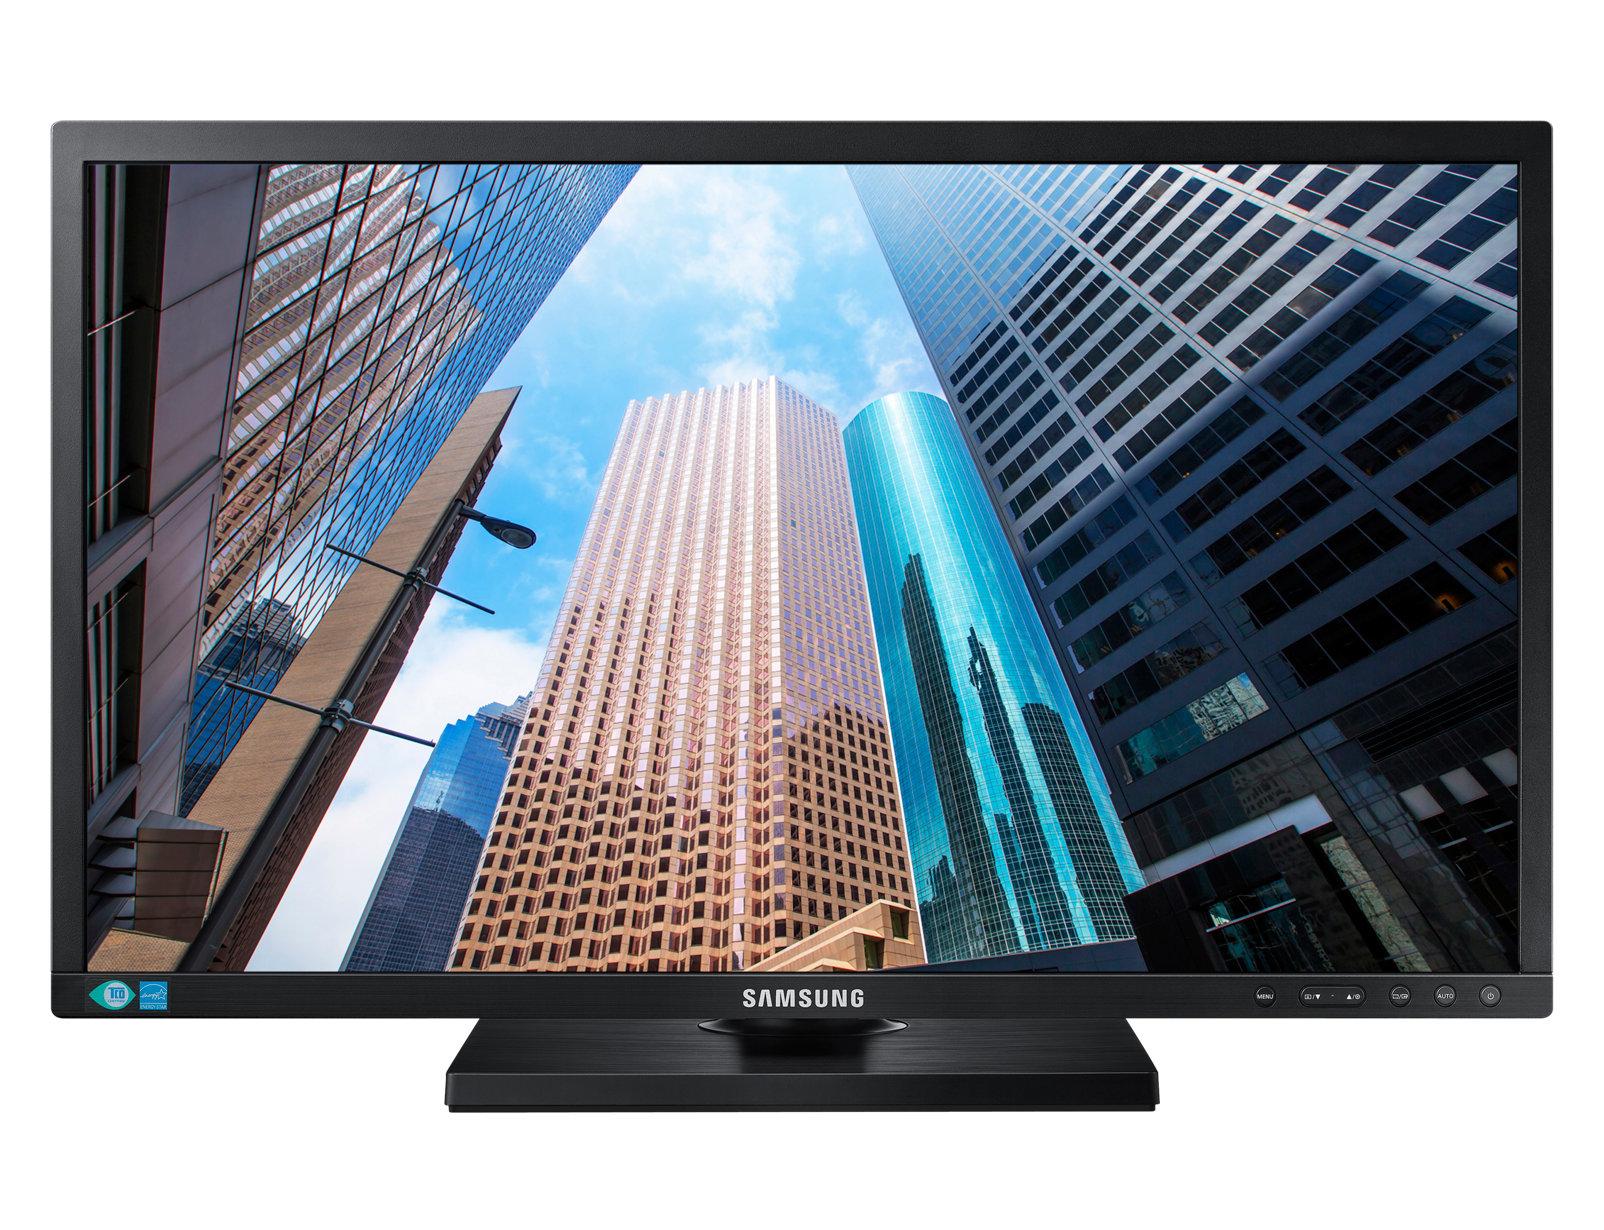 "Samsung S27E450B computer monitor 68.6 cm (27"") Full HD LED Flat Black"